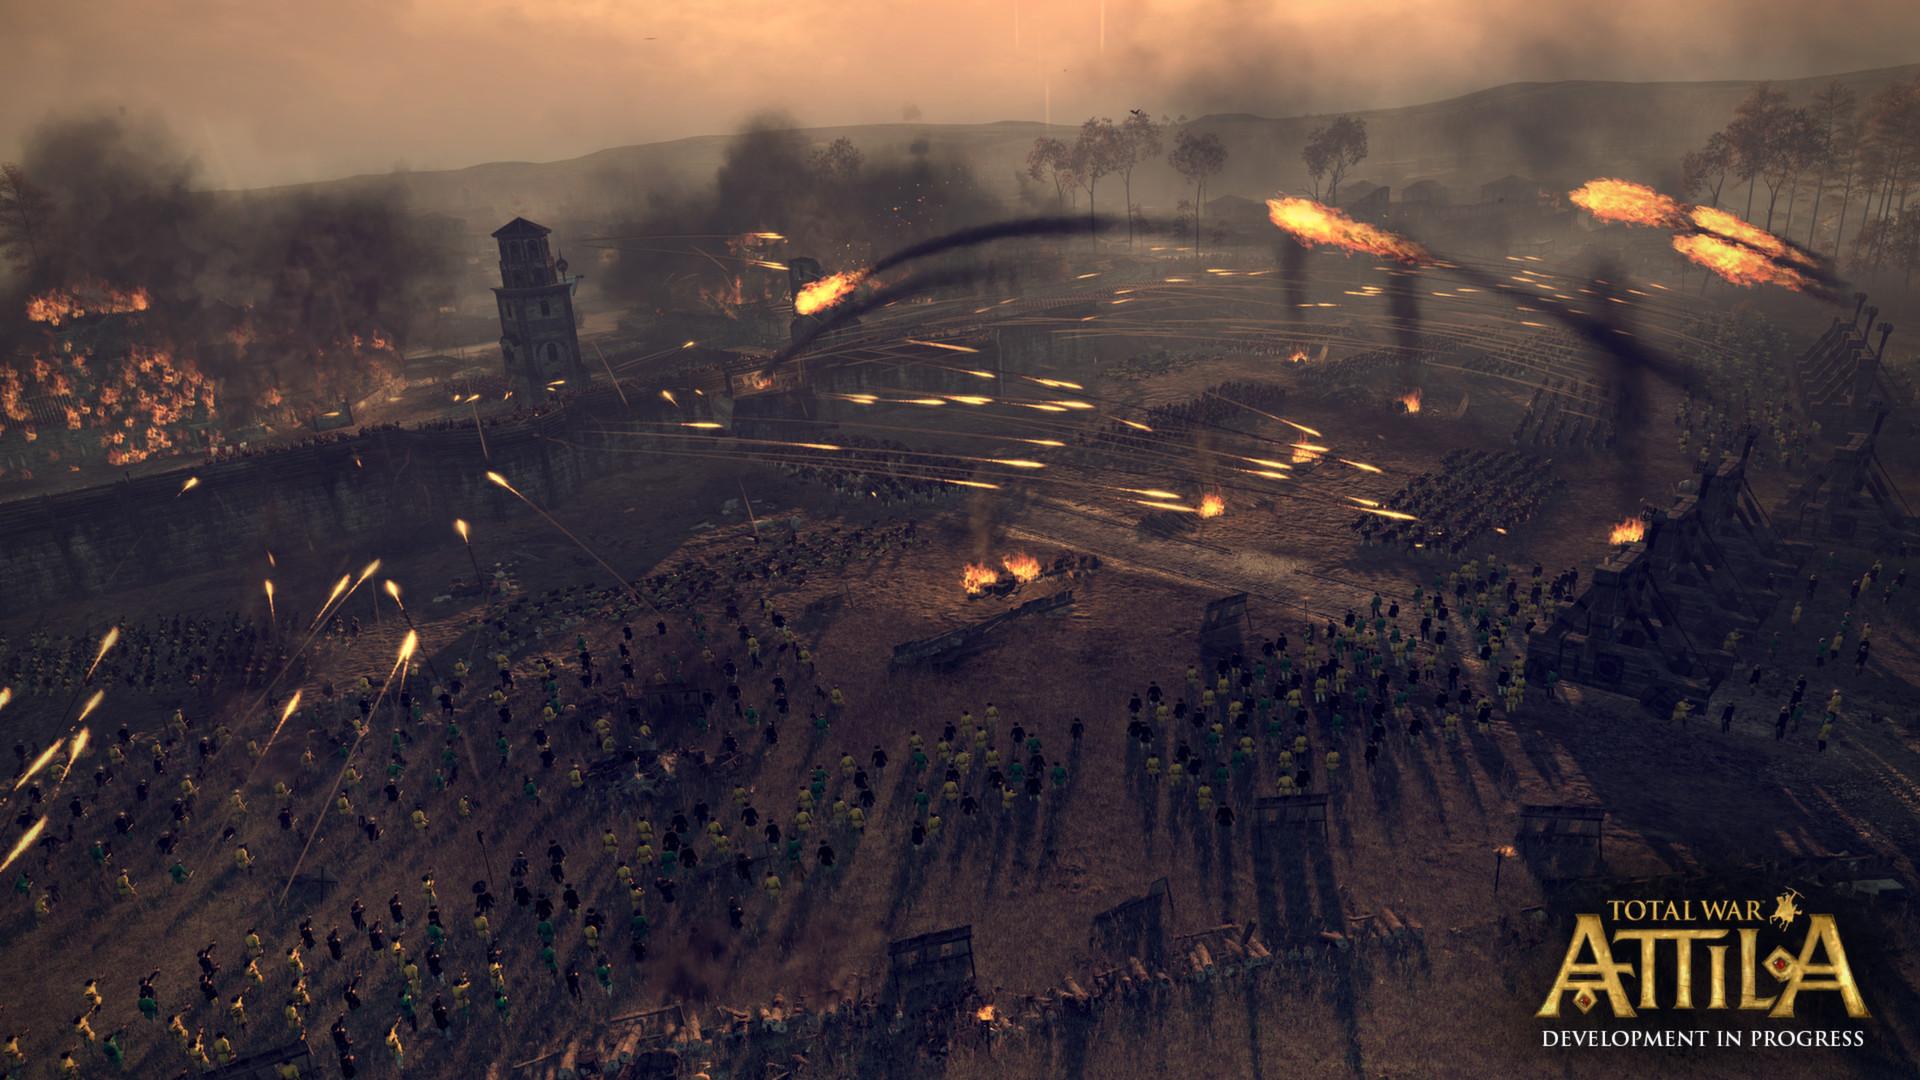 Total War Attila ESPAÑOL Full PC Incluye DLC (CPY) + REPACK 2 DVD5 (JPW) 2